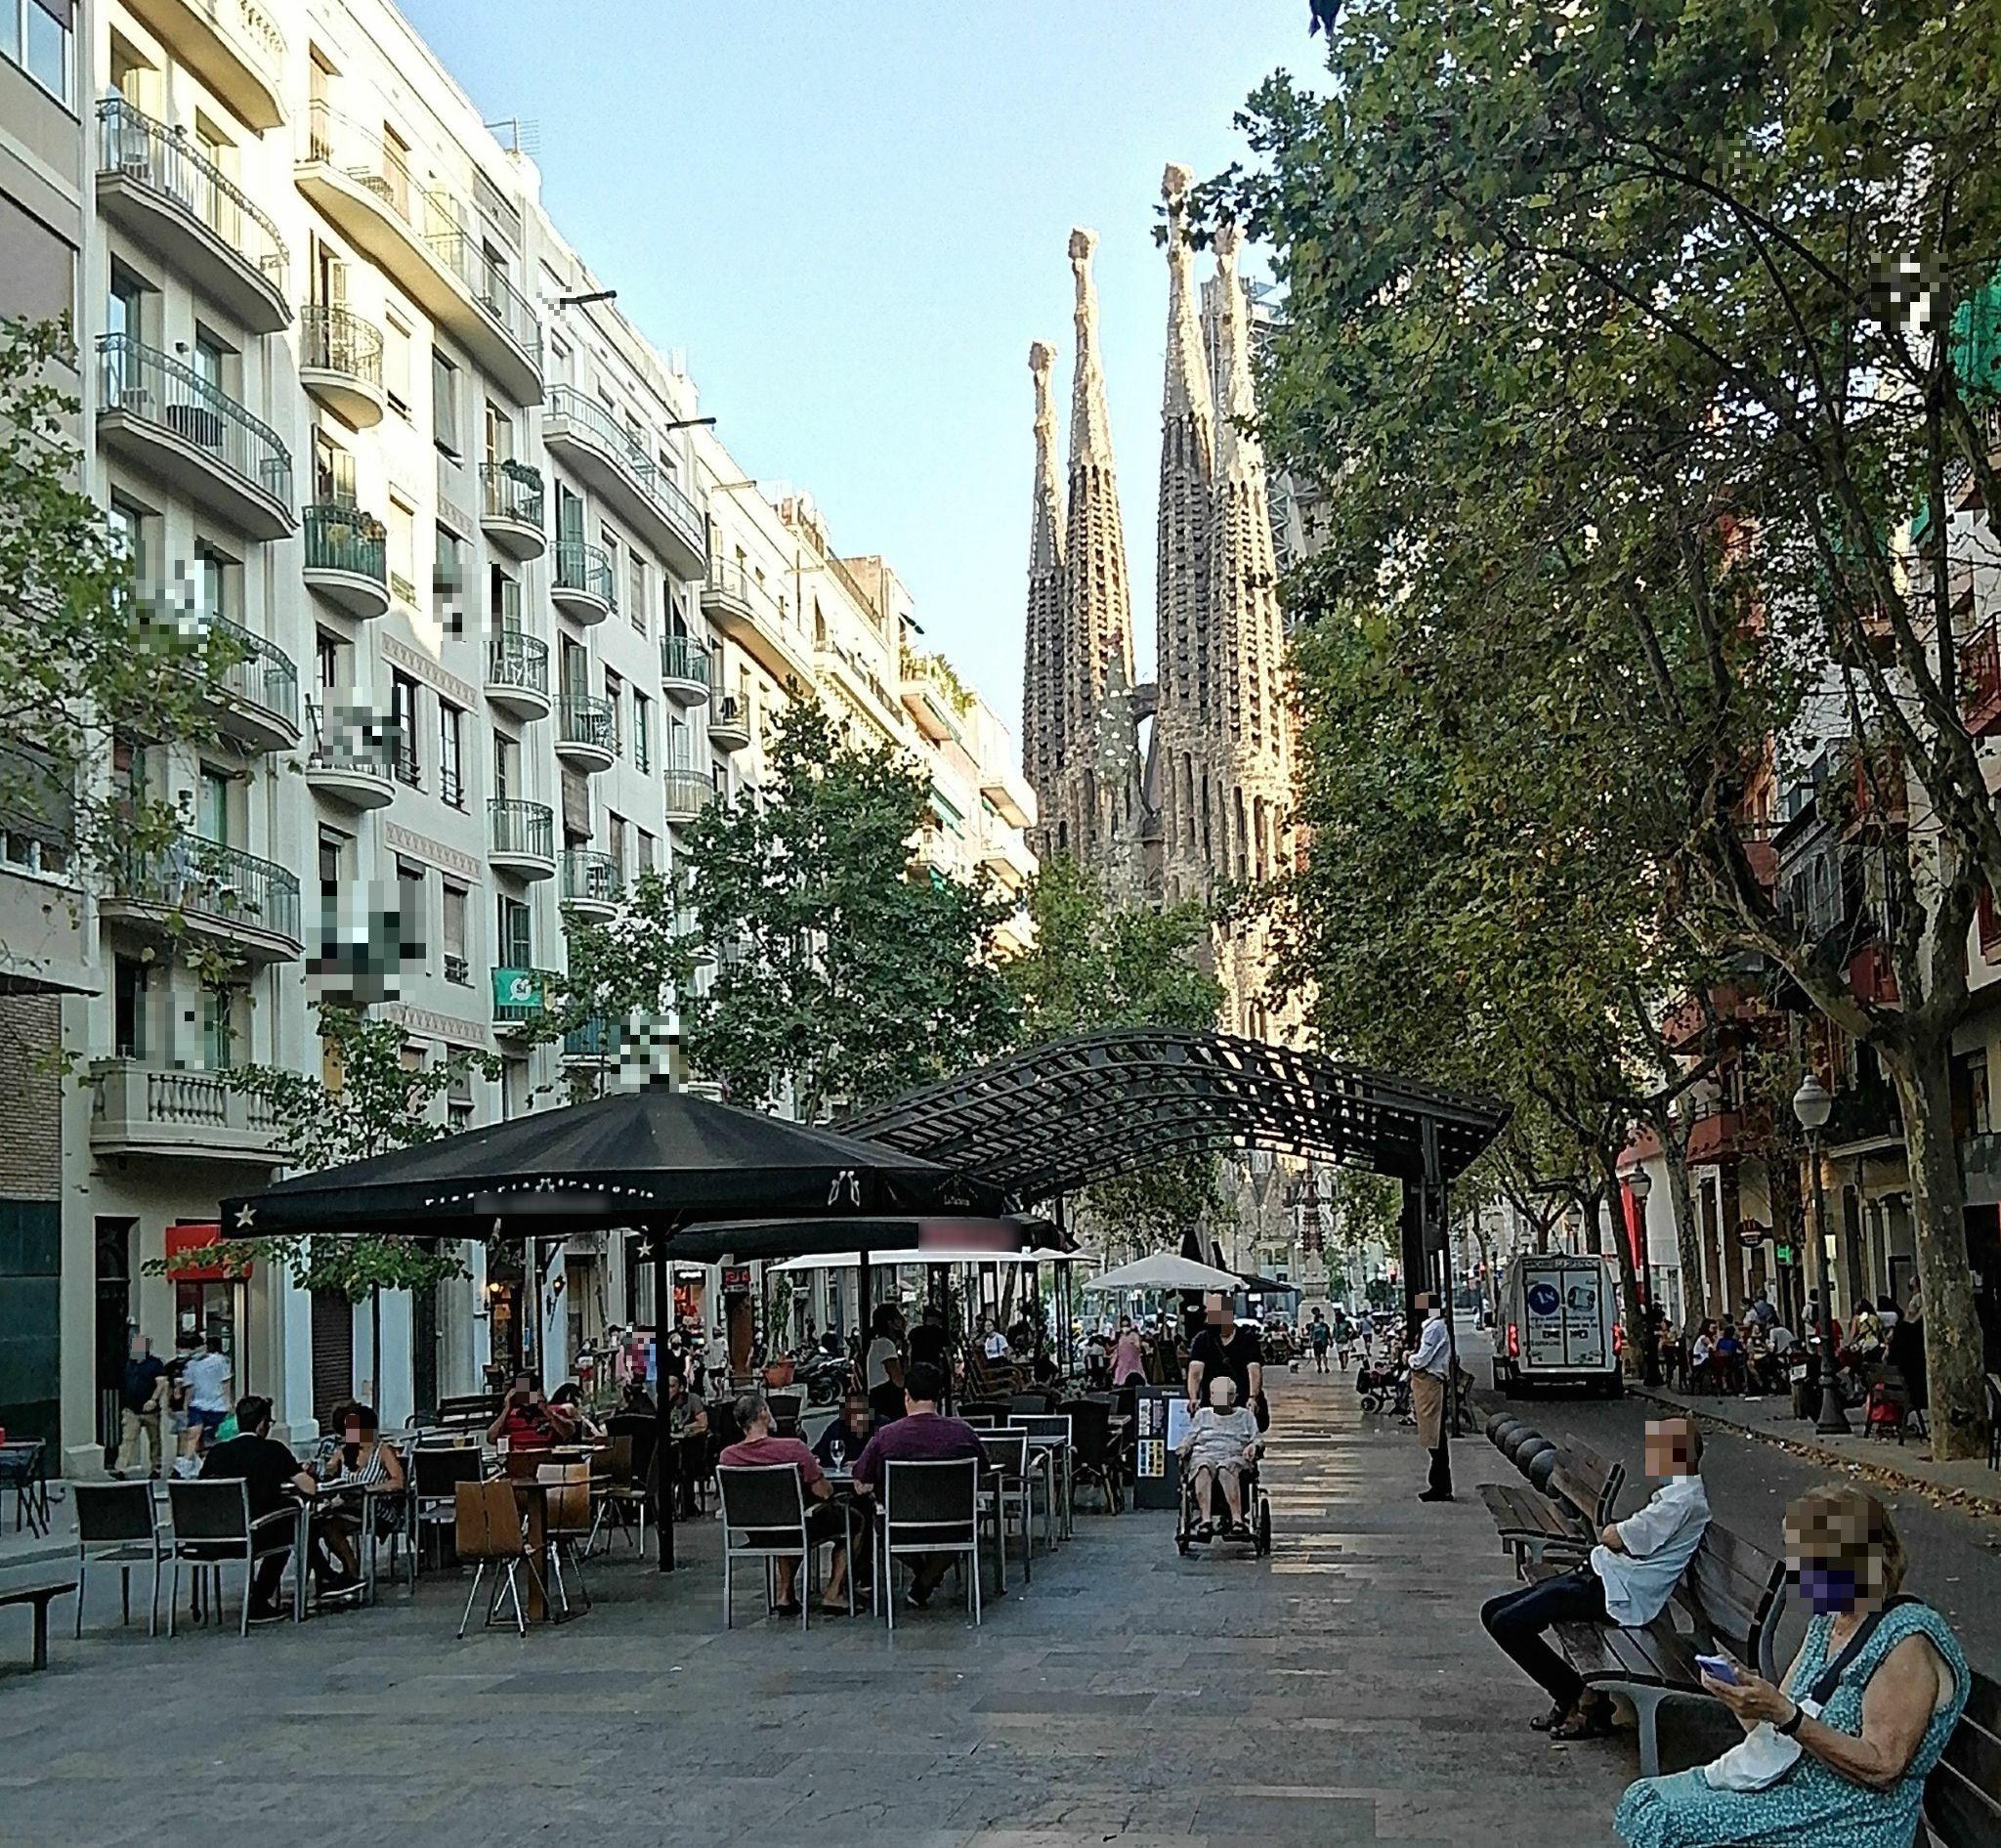 Avinguda de Gaudí, 27 - avinguda oKupada